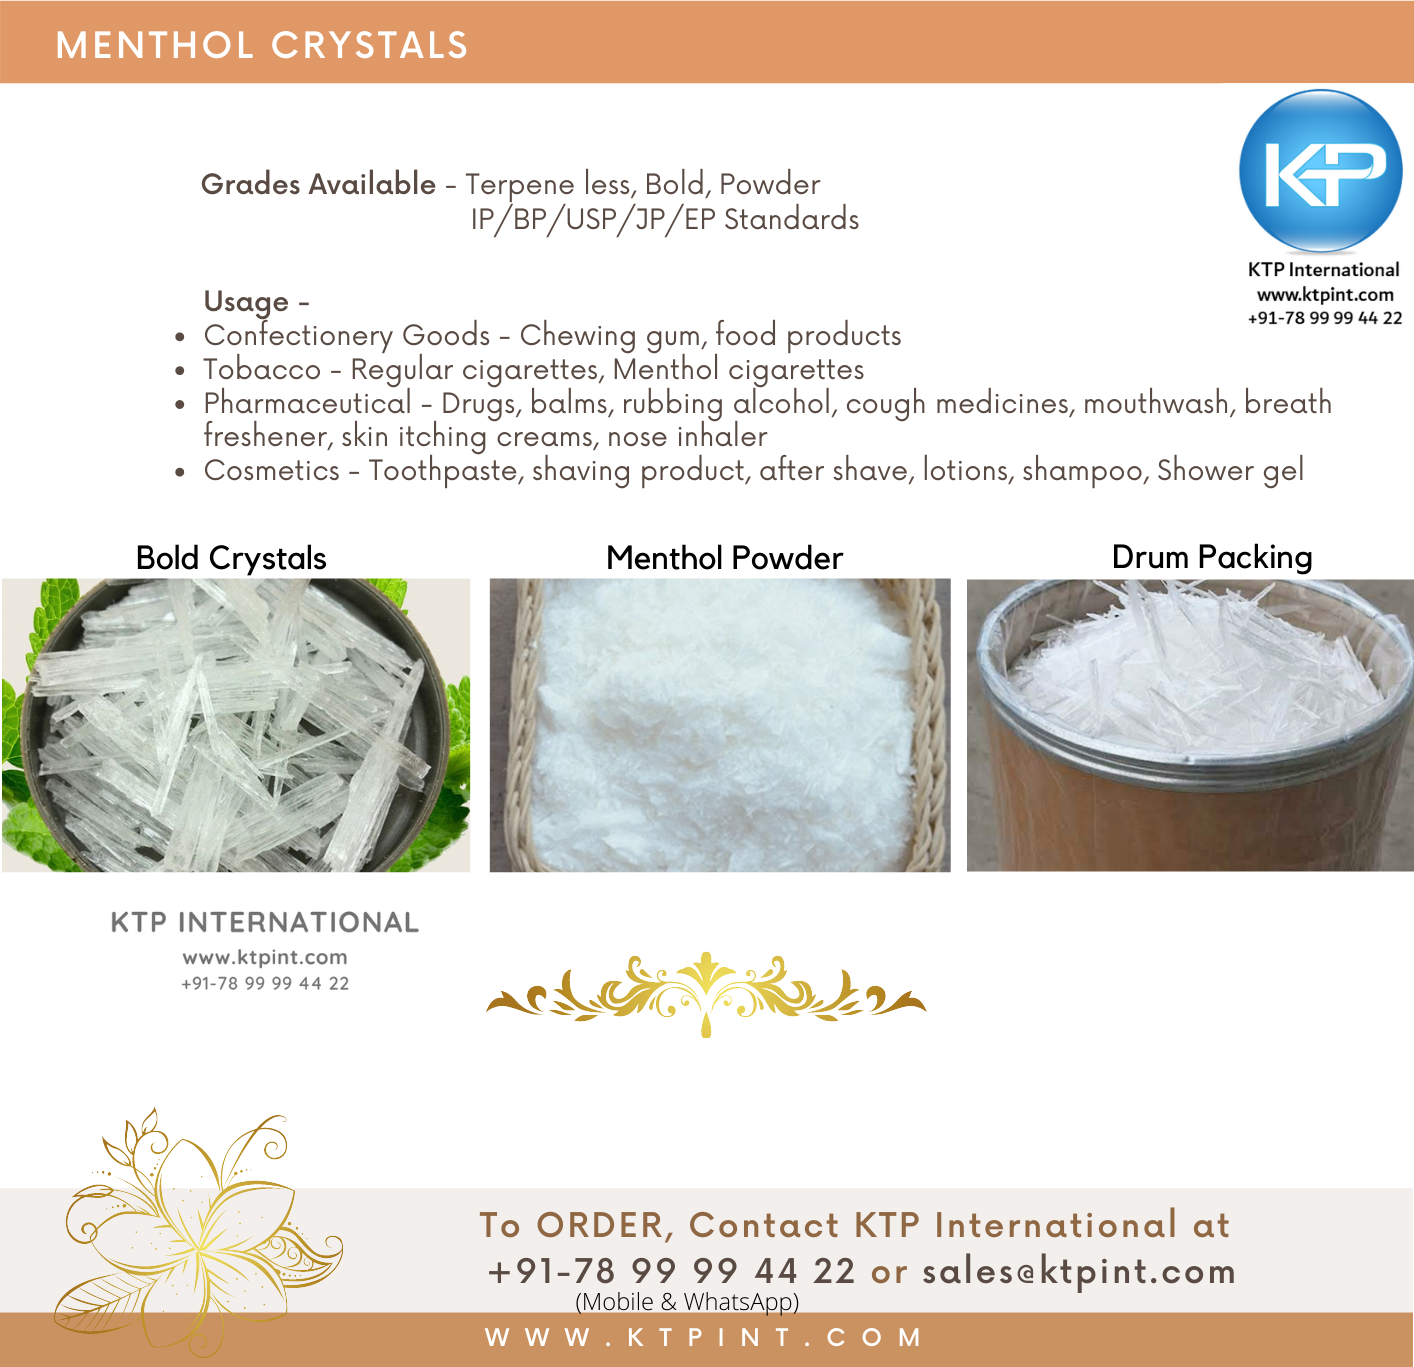 Buy, Purchase, Menthol Crystals, Bold menthol crystals, Terpeneless, Menthol Crystals powder, India, Bangalore, Gujarat